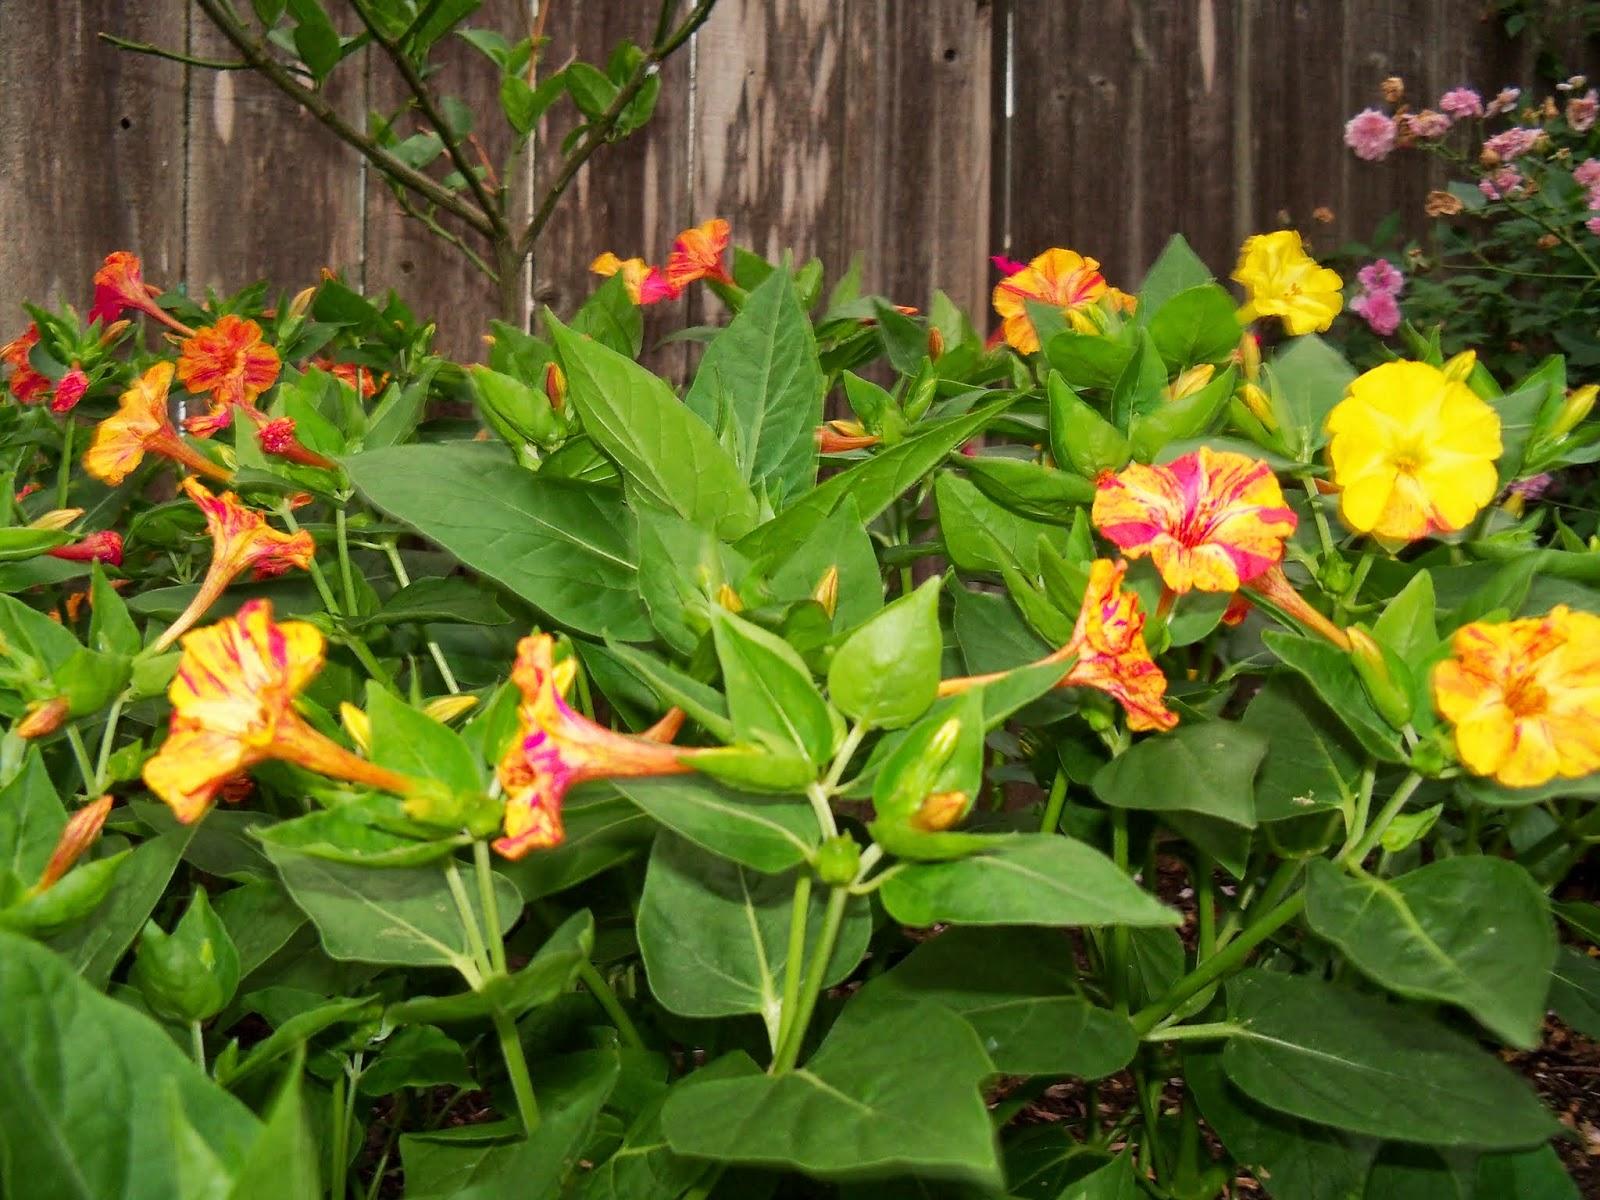 Gardening 2014 - 116_1965.JPG